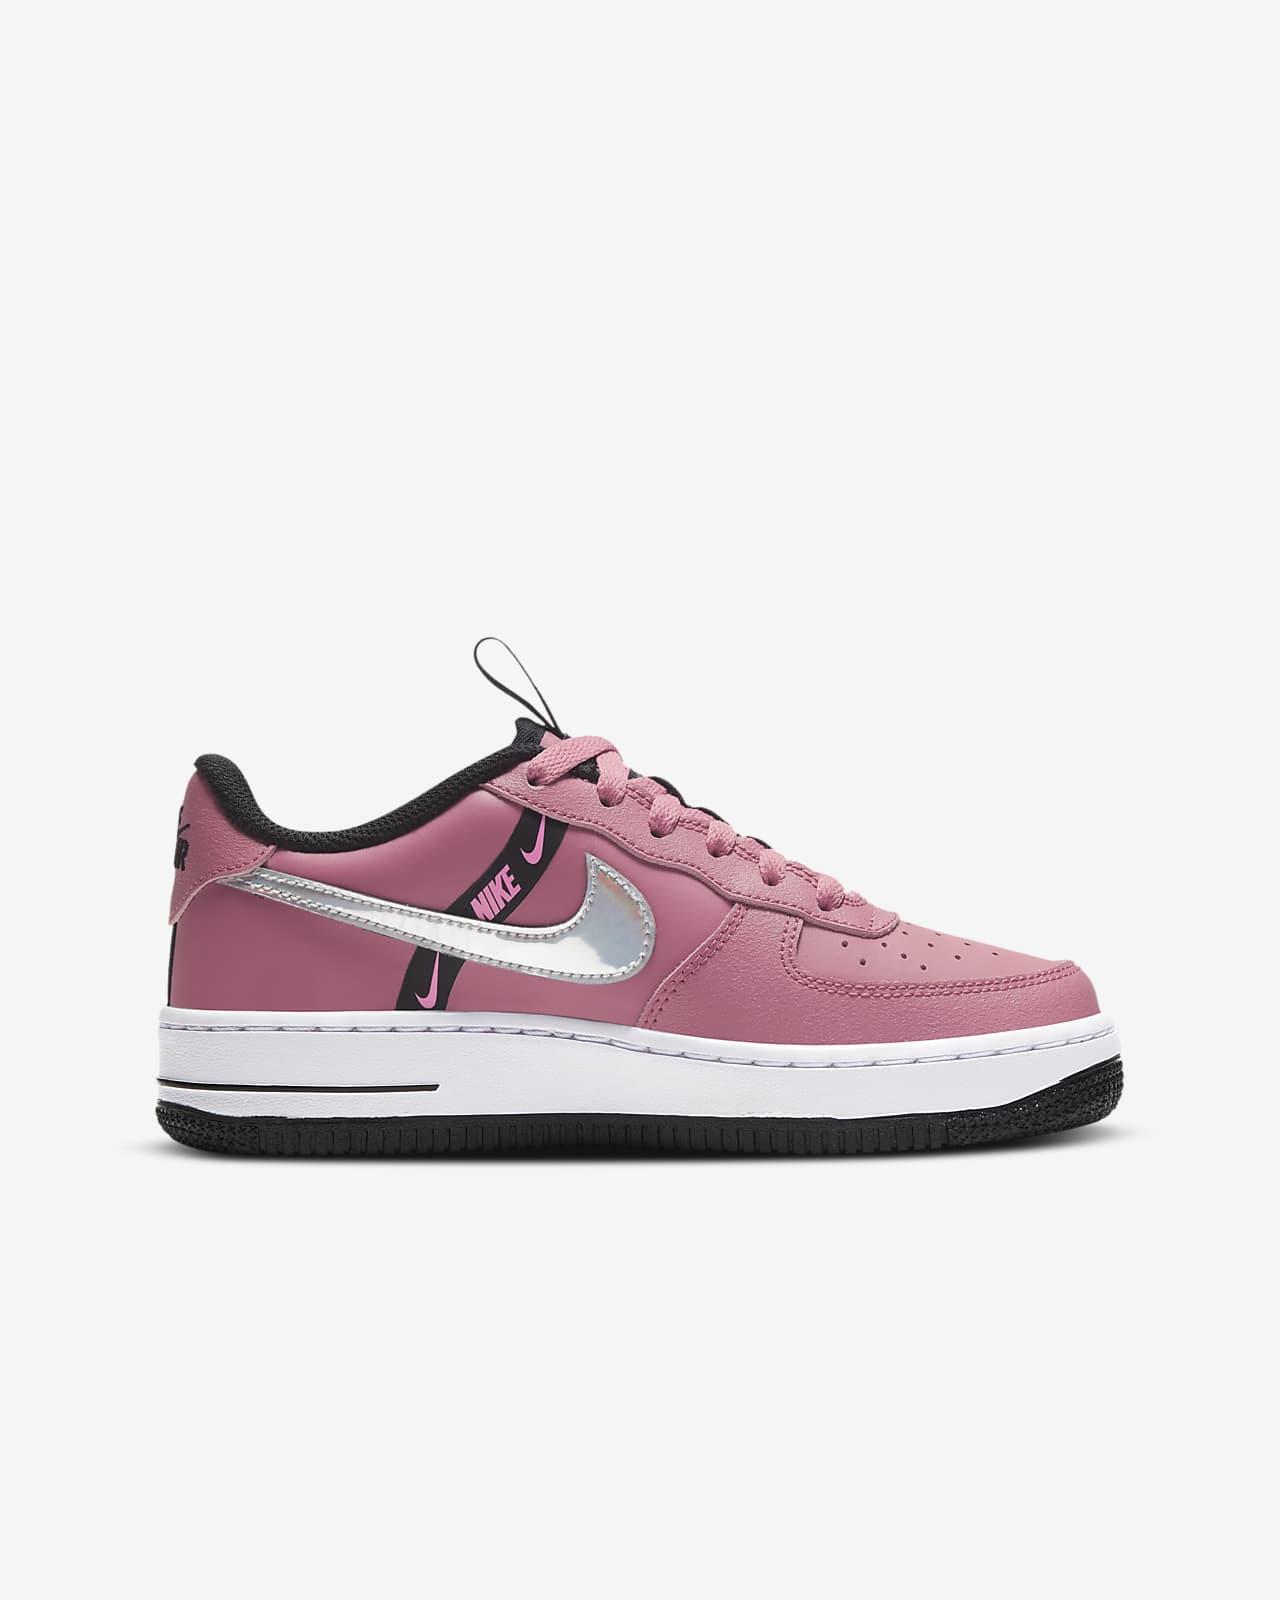 retorta crisis Horizontal  Nike Air Force 1 LV8 Older Kids' Shoe. Nike PH